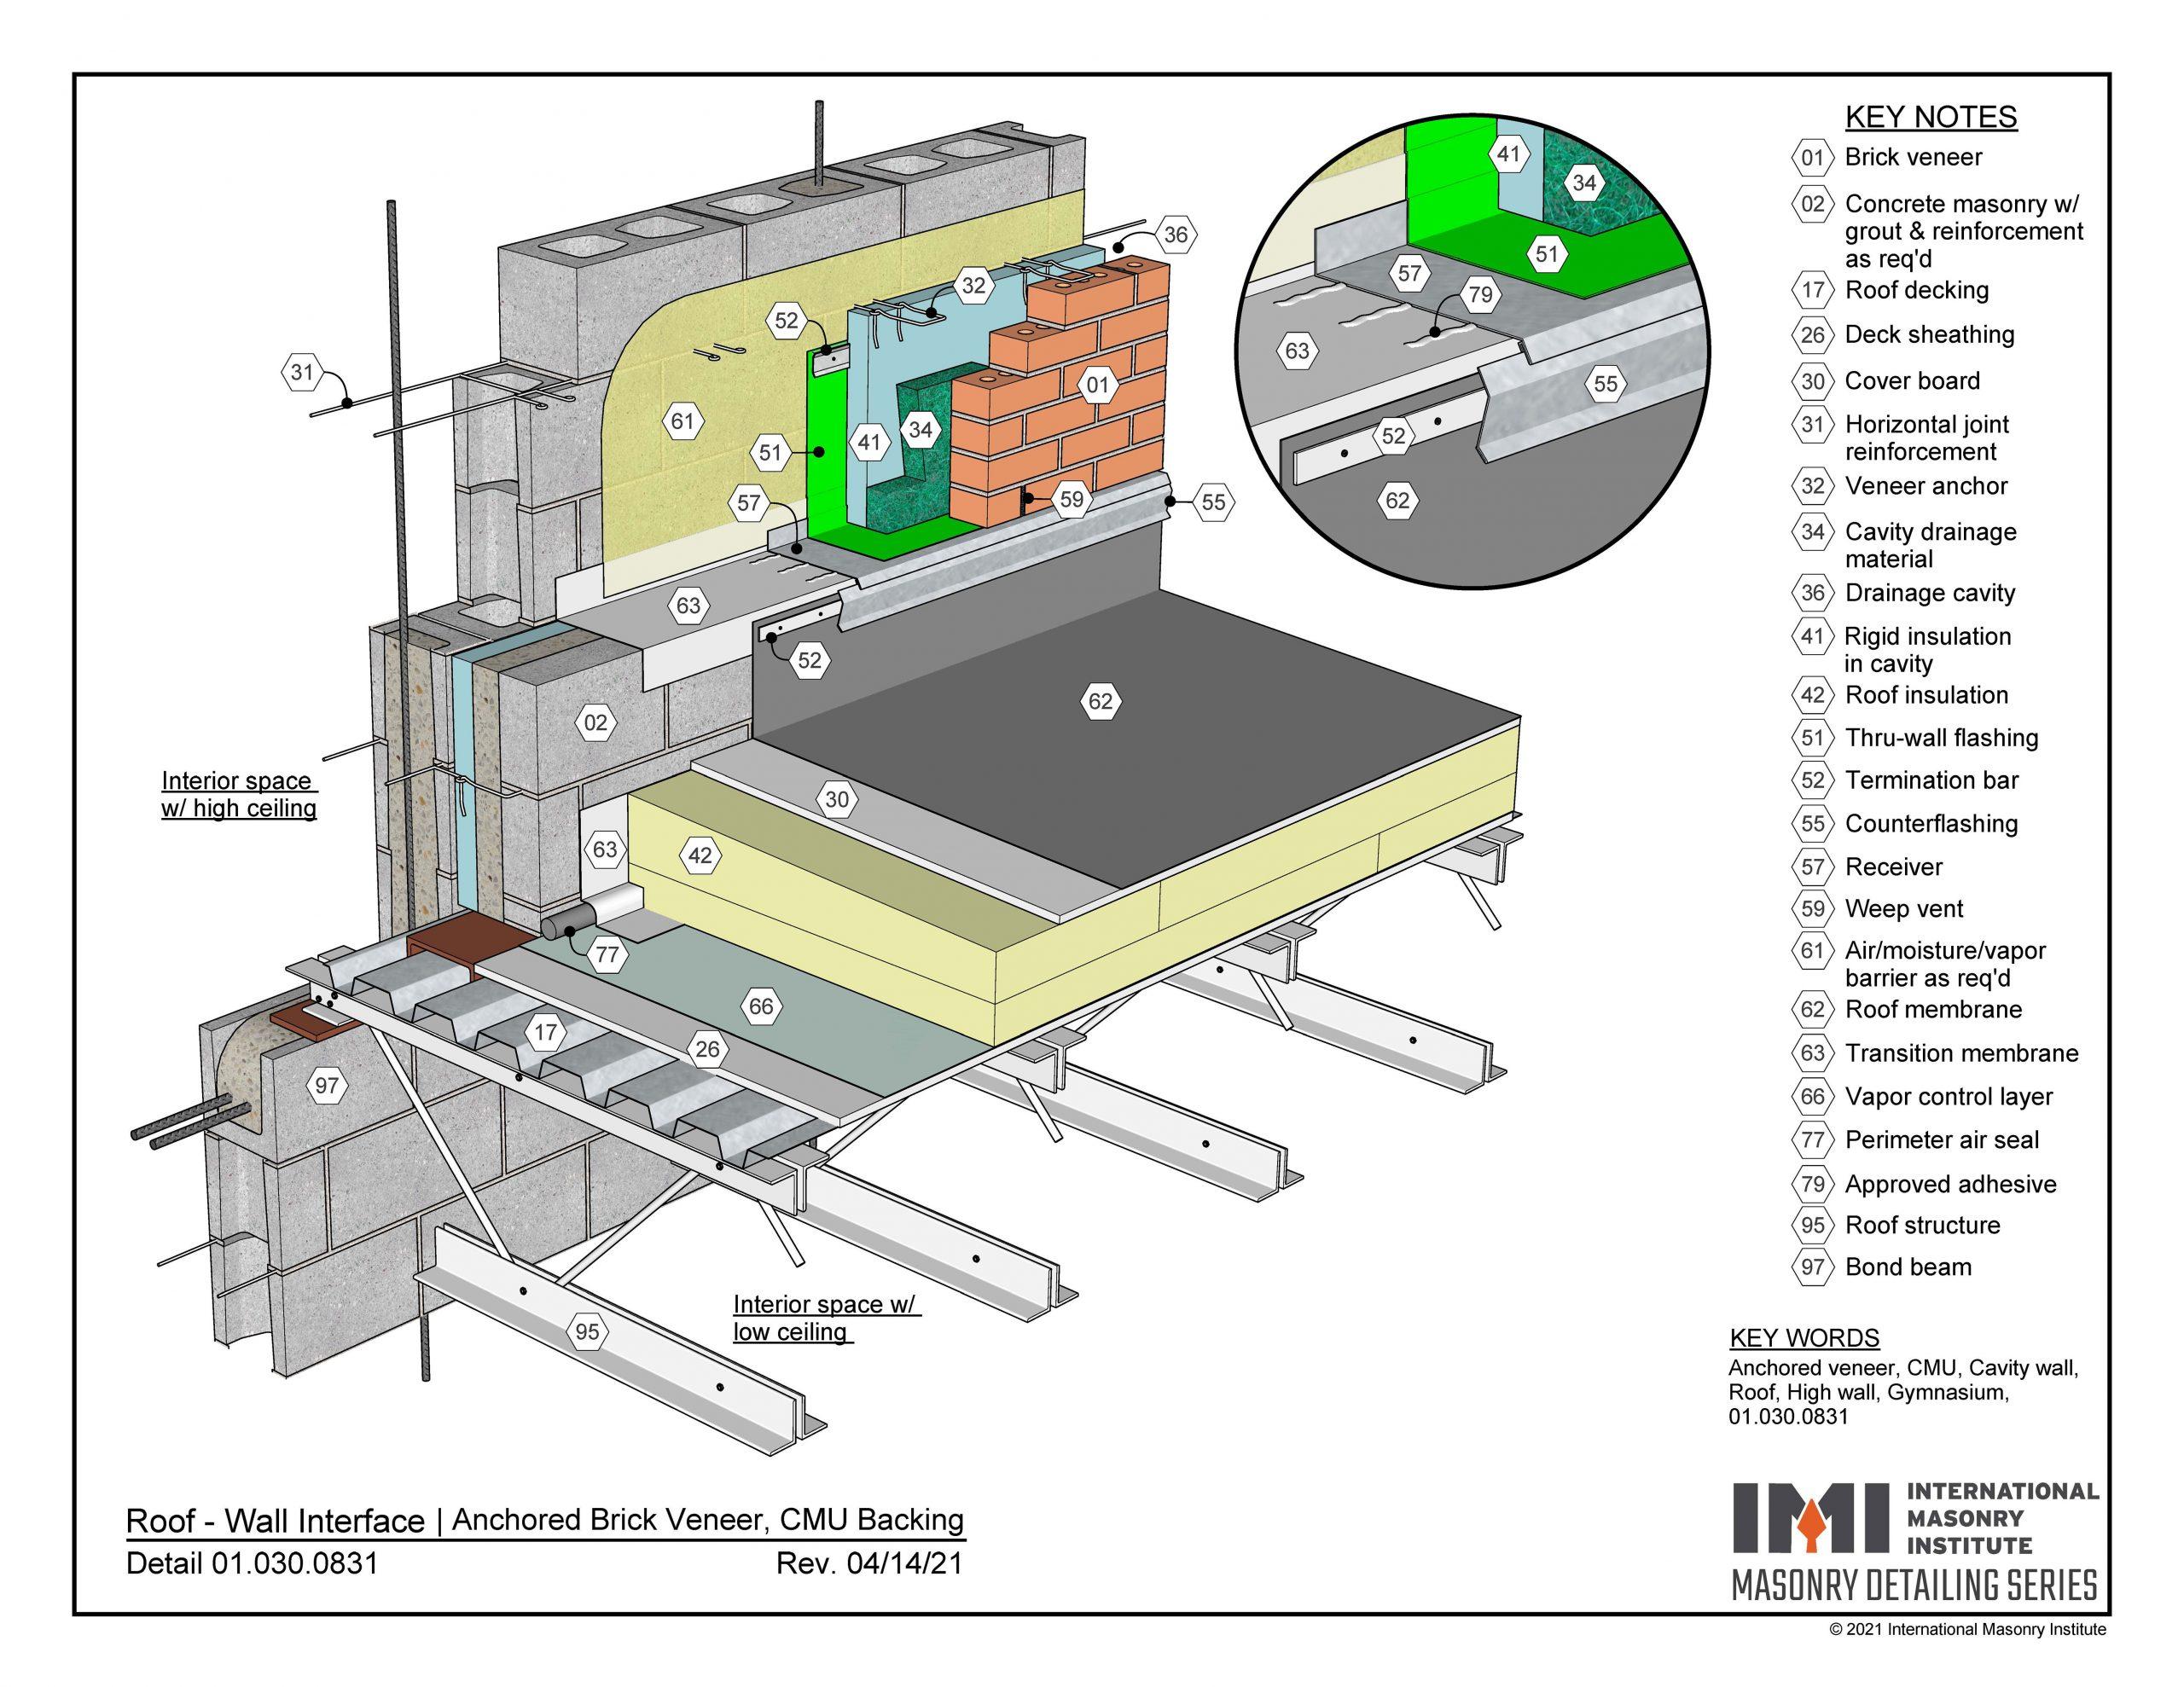 Roof wall interface: anchored brick veneer with CMU backing